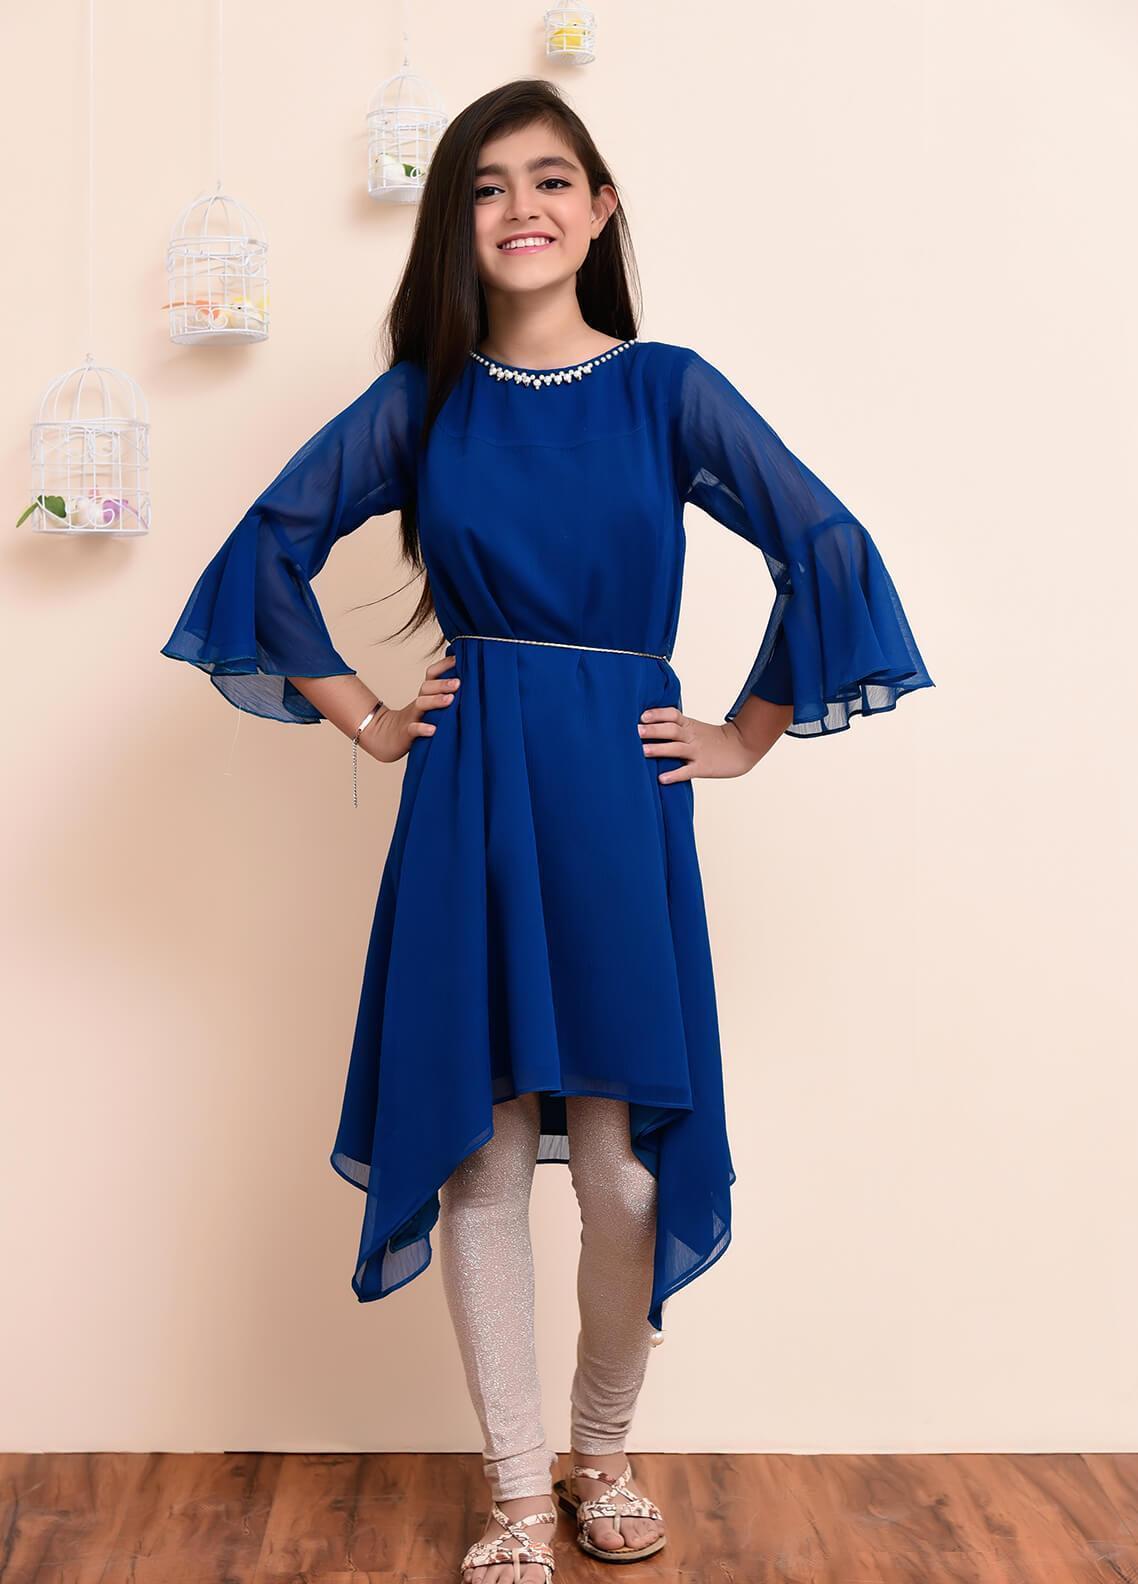 Ochre Chiffon Formal Girls Kurtis -  OFW 163 Teal Blue